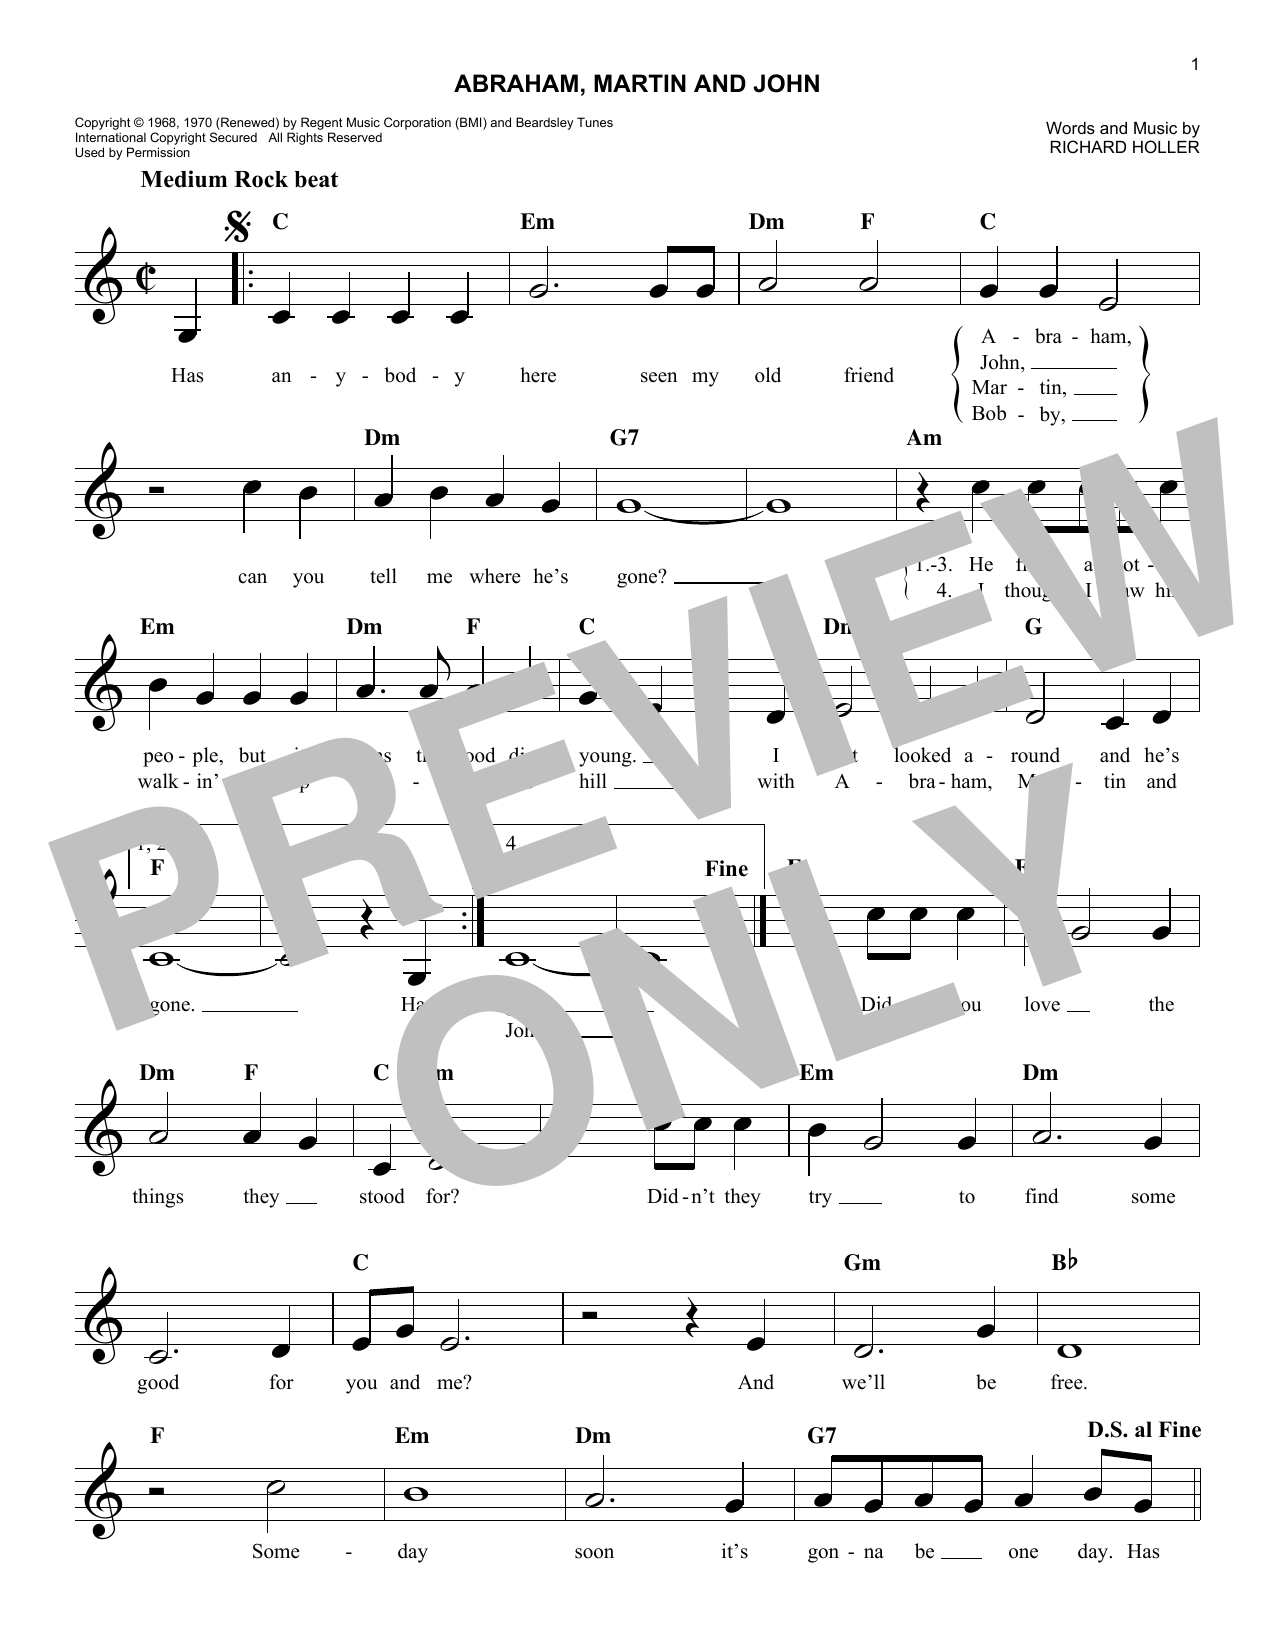 Abraham, Martin And John (Melody Line, Lyrics & Chords)